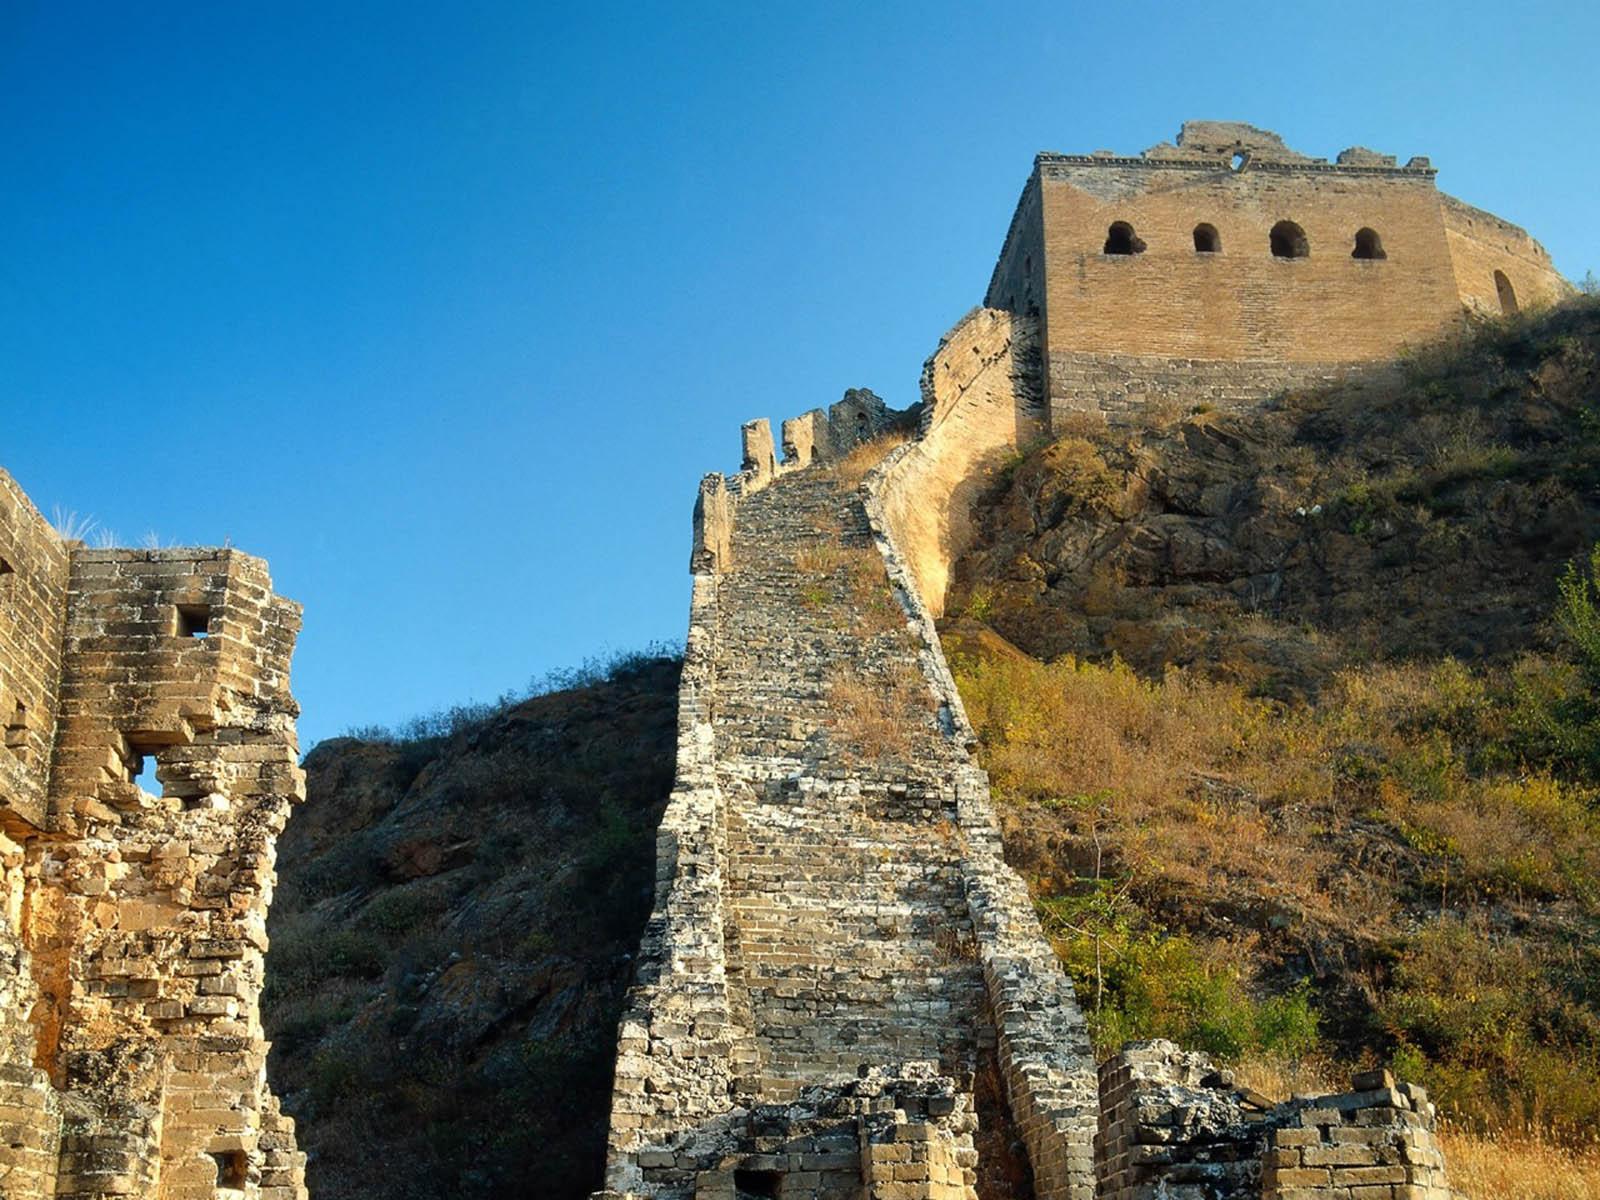 Free Download 3d Wallpapers For Windows 7 Desktop Wallpapers Great Wall Of China Wallpapers